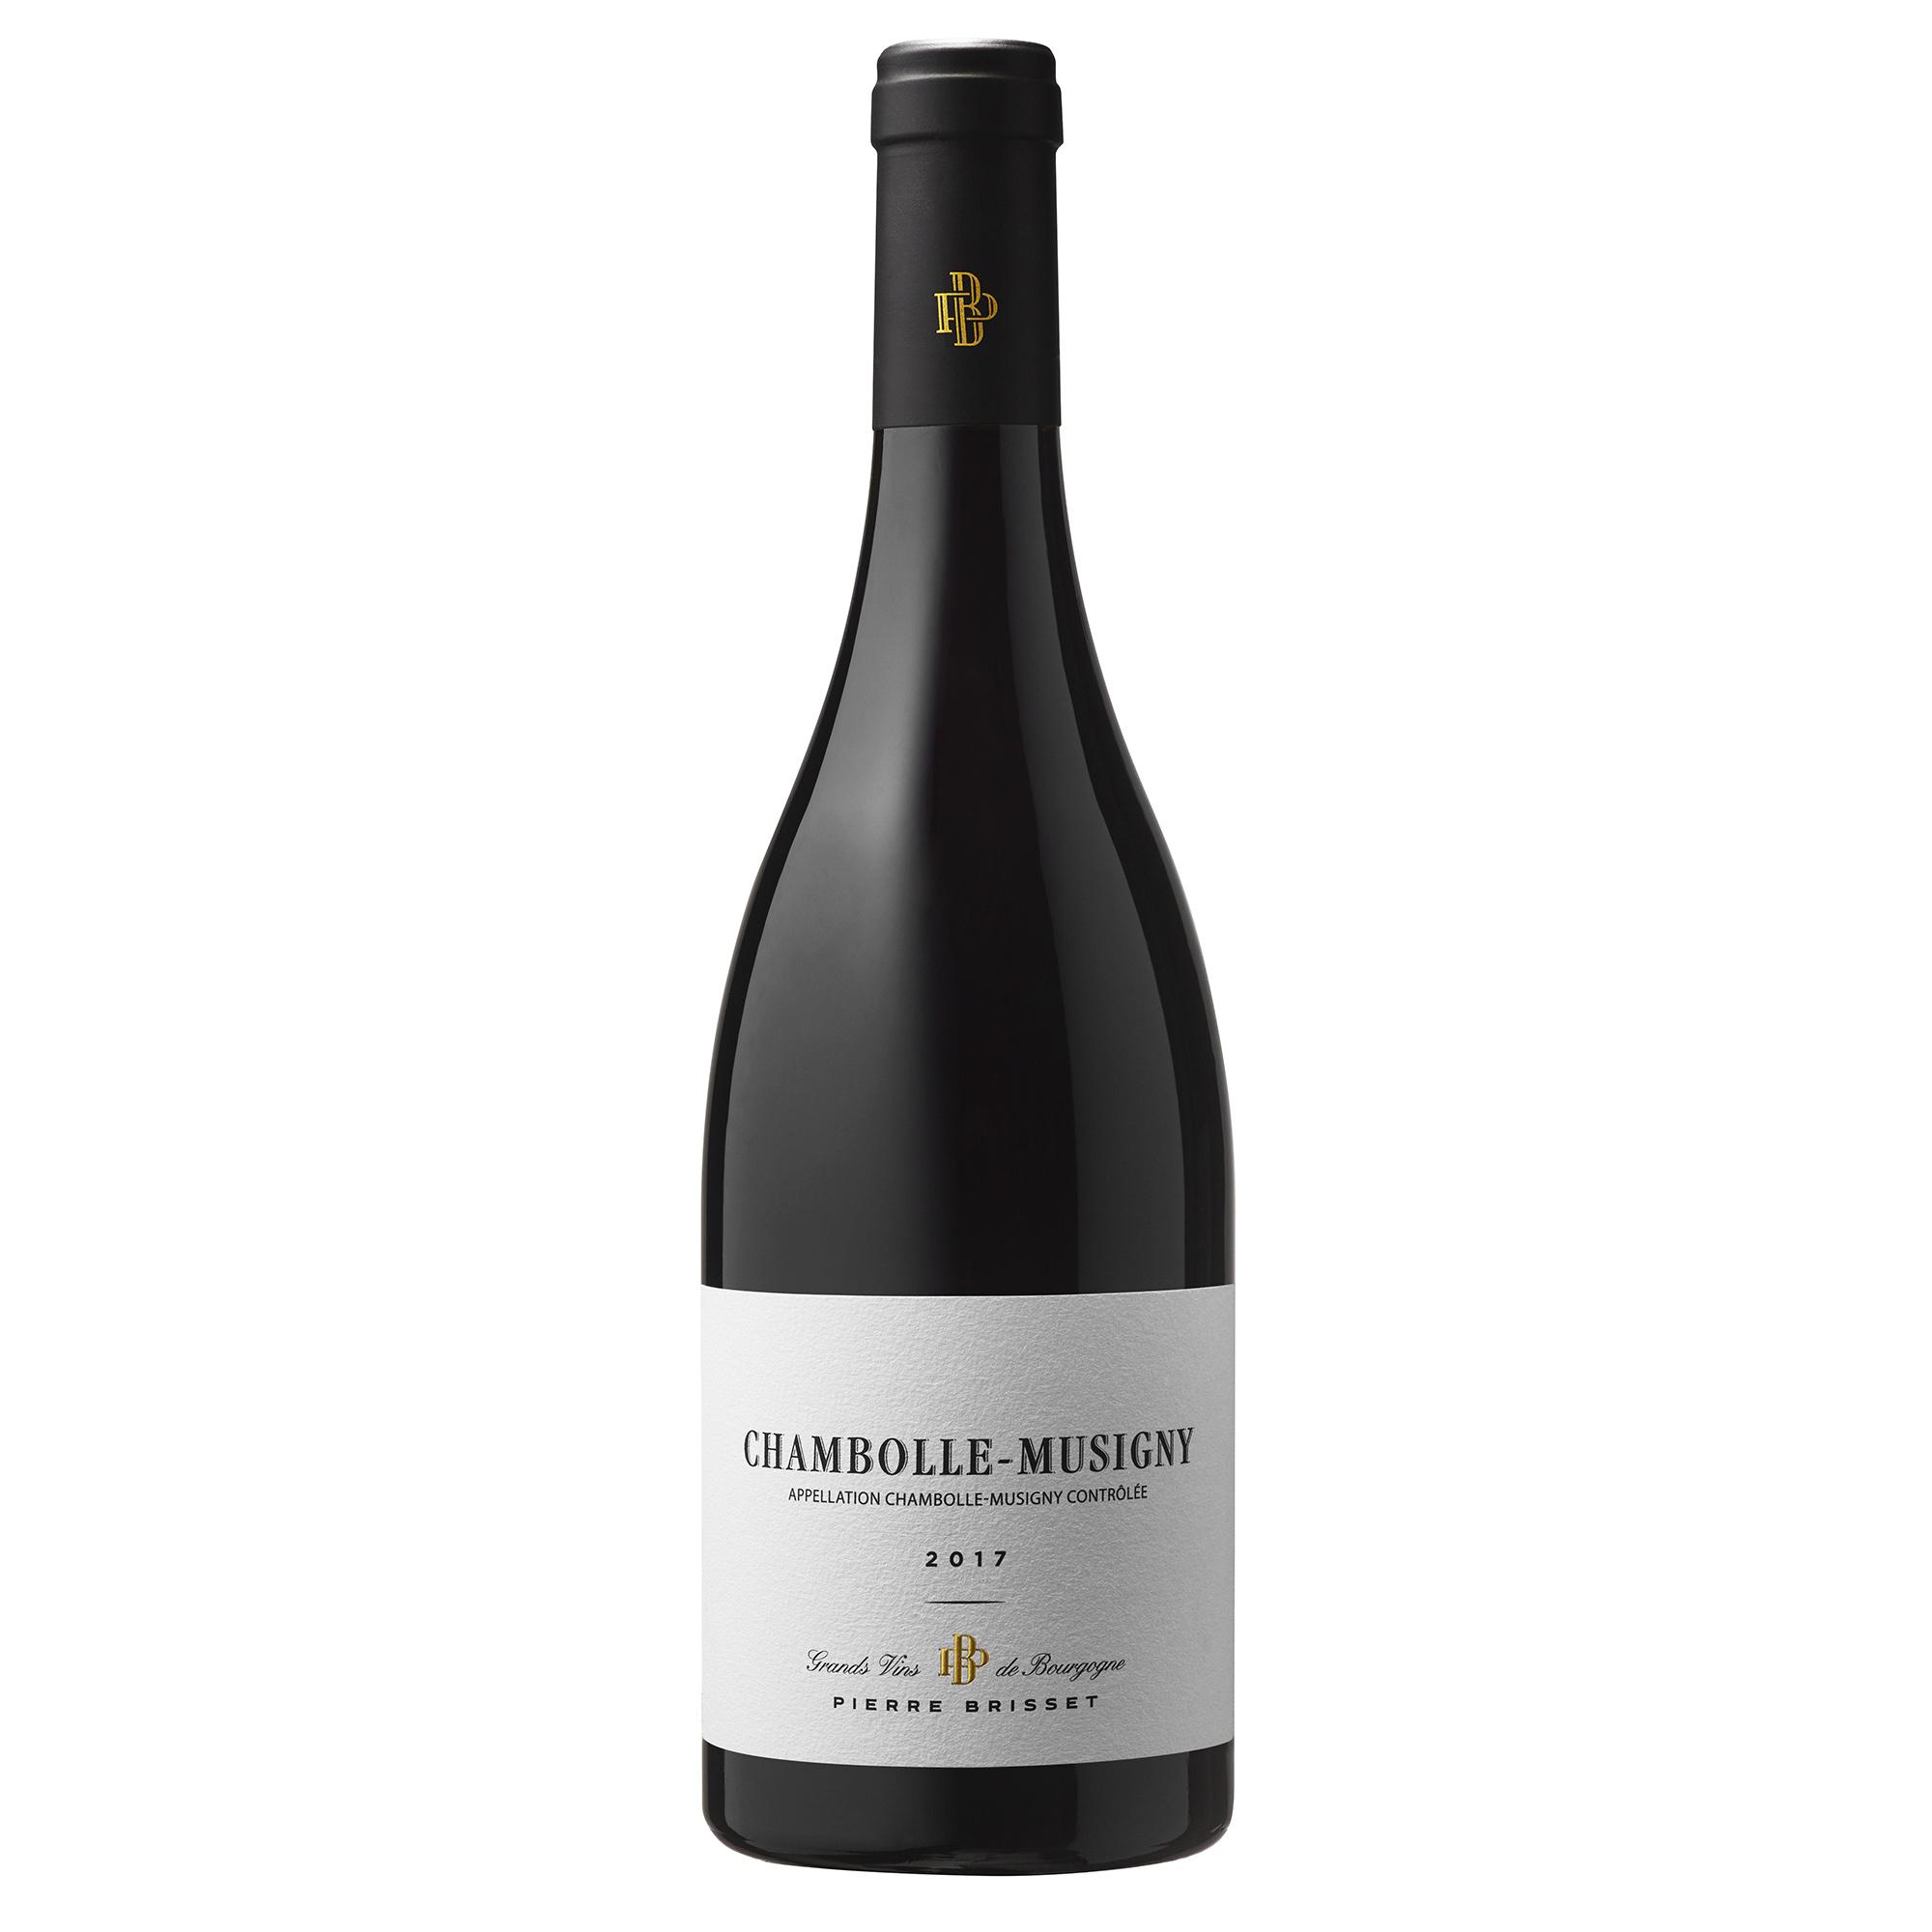 Chambolle Musigny 2017